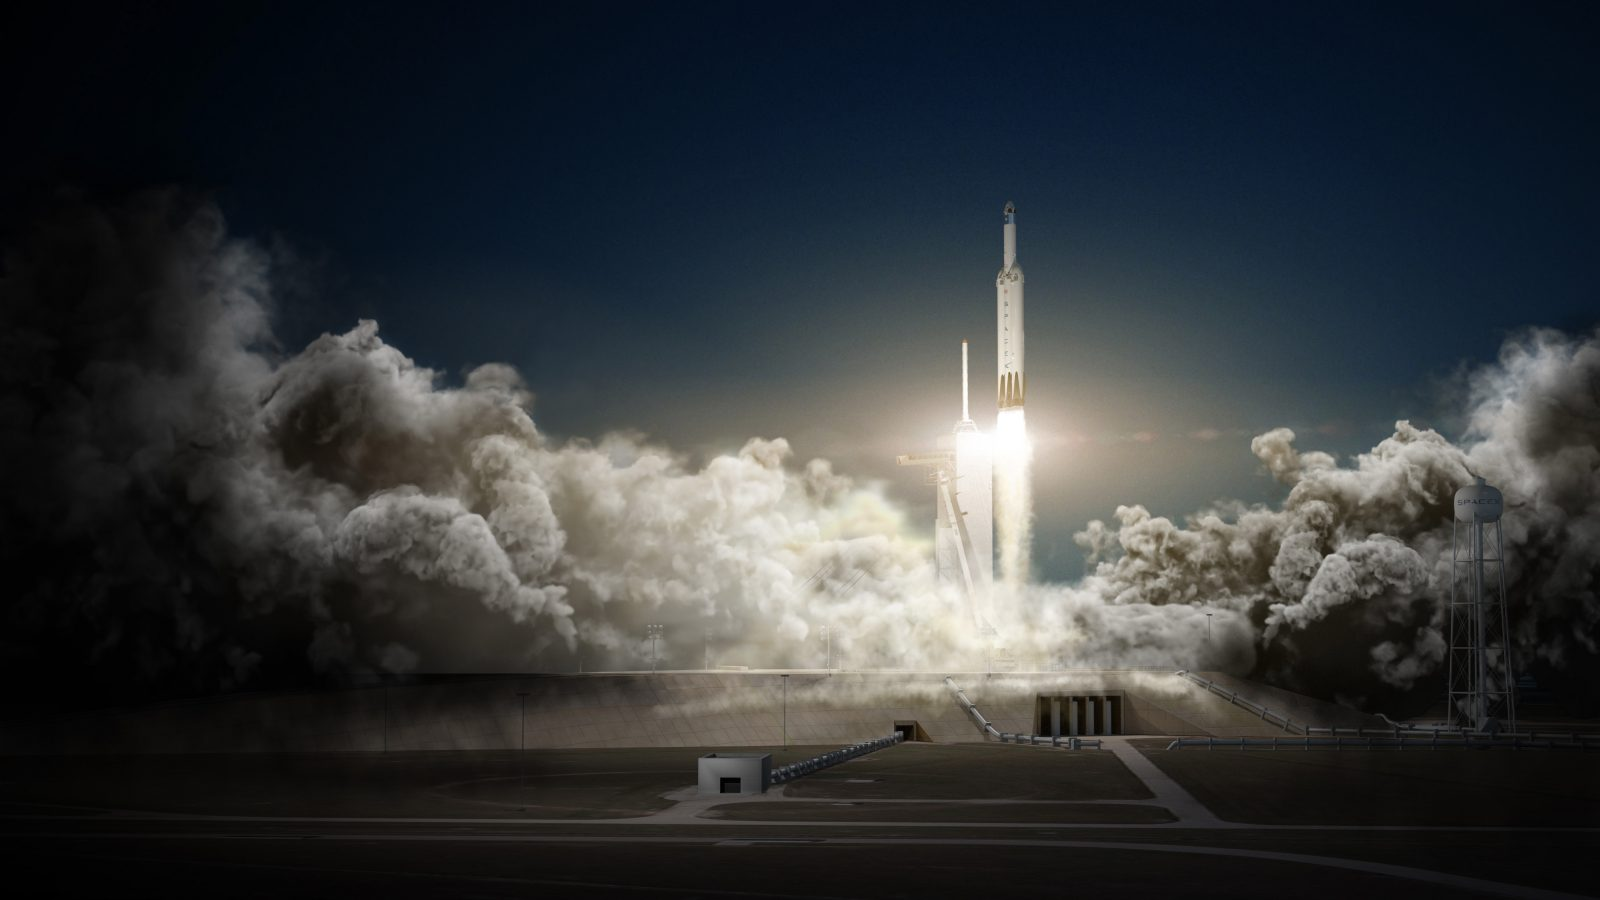 Elon Musk, SpaceX, Falcon Heavy, Dragon